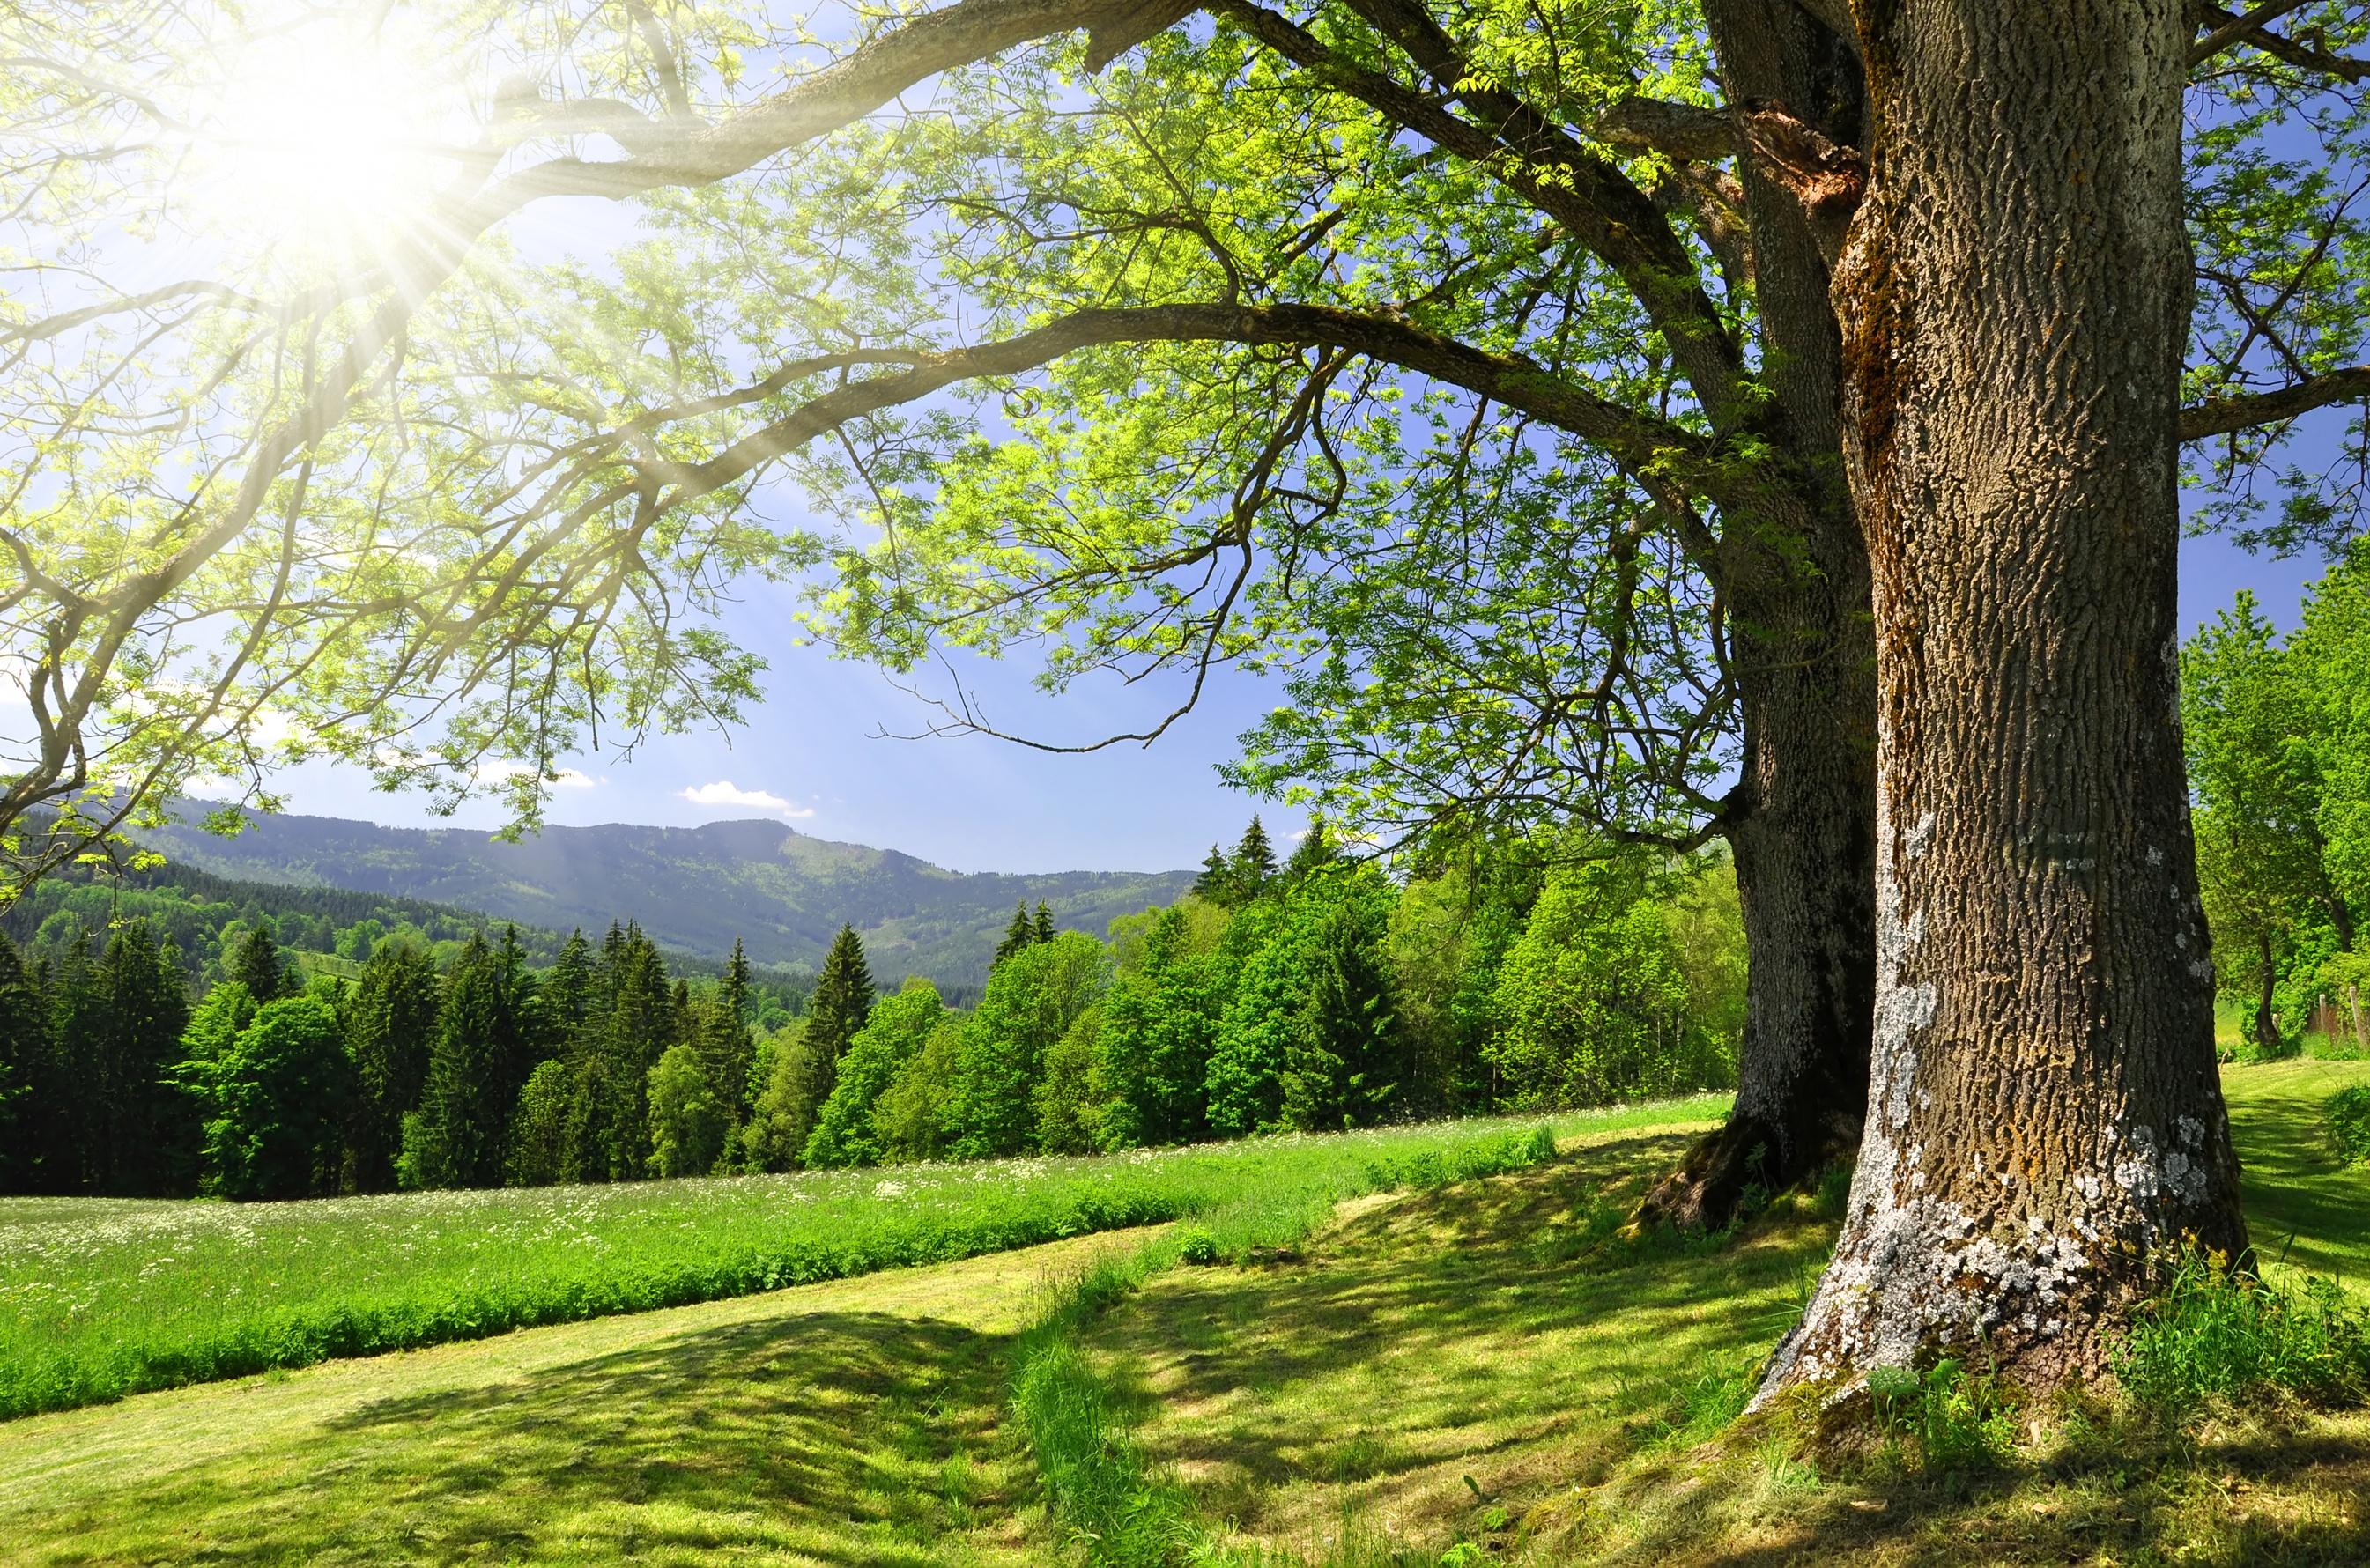 cartwright tree care